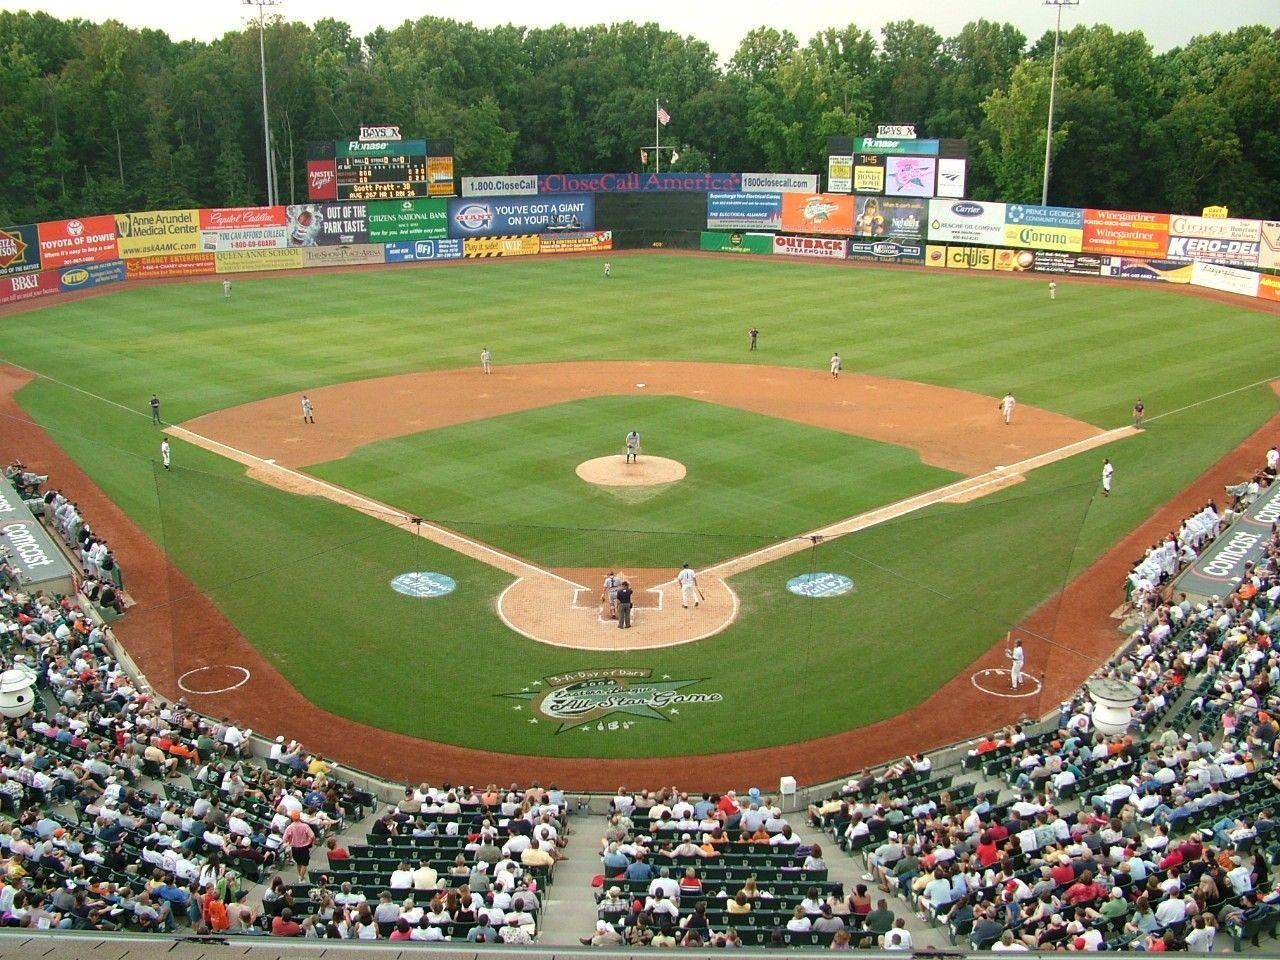 Prince George S Stadium Bowie Md Baseball Stadium Baltimore Orioles Minor League Baseball